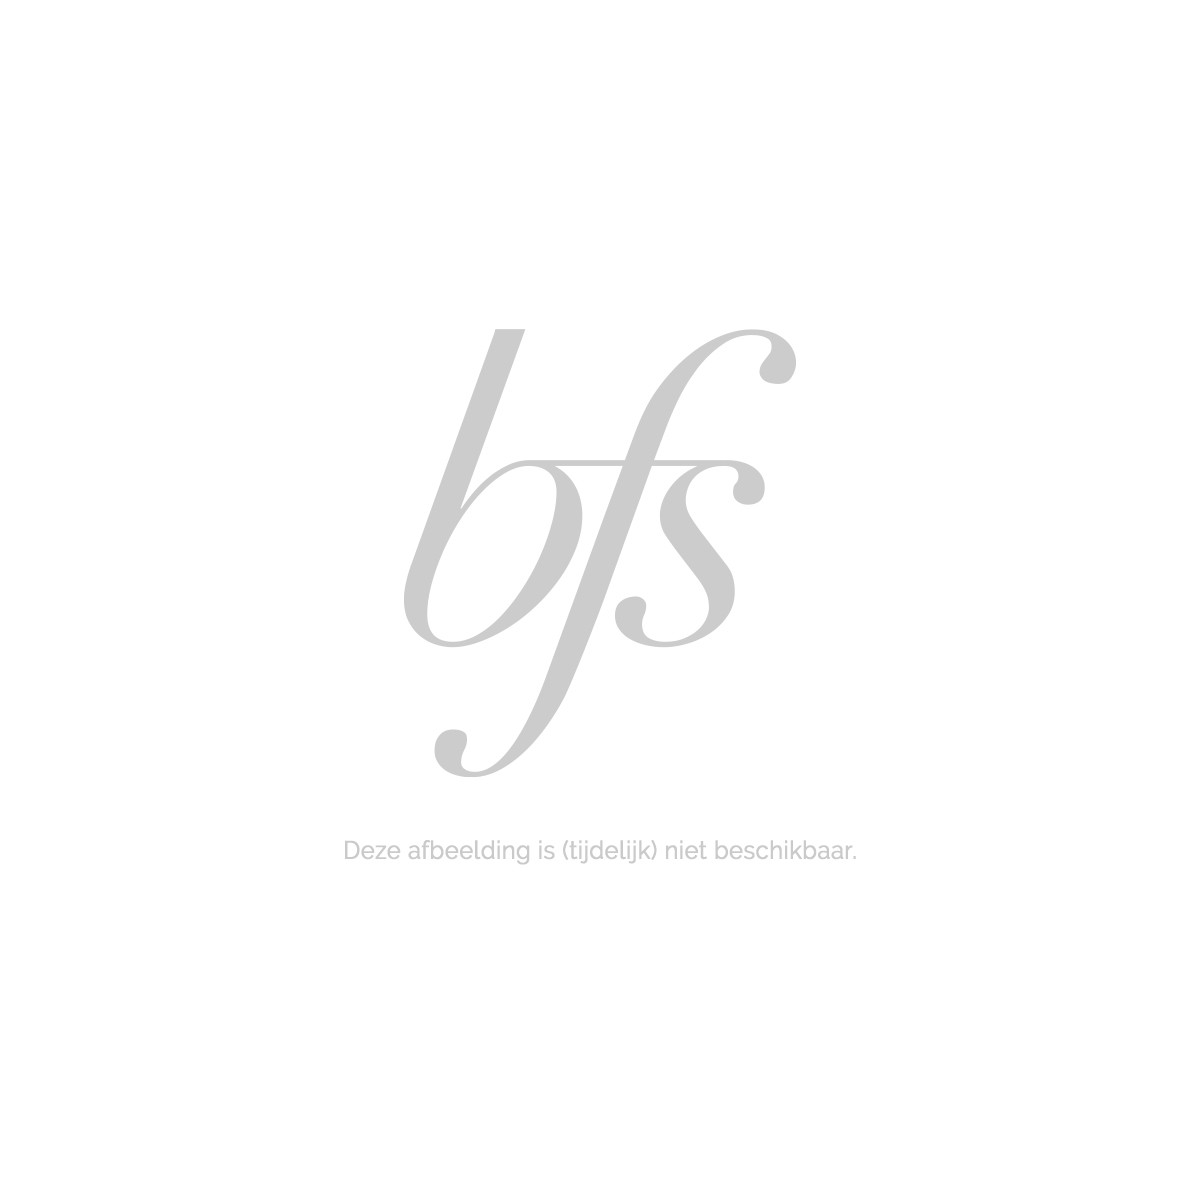 Chanel No 5 Giftset 60 (2) ml